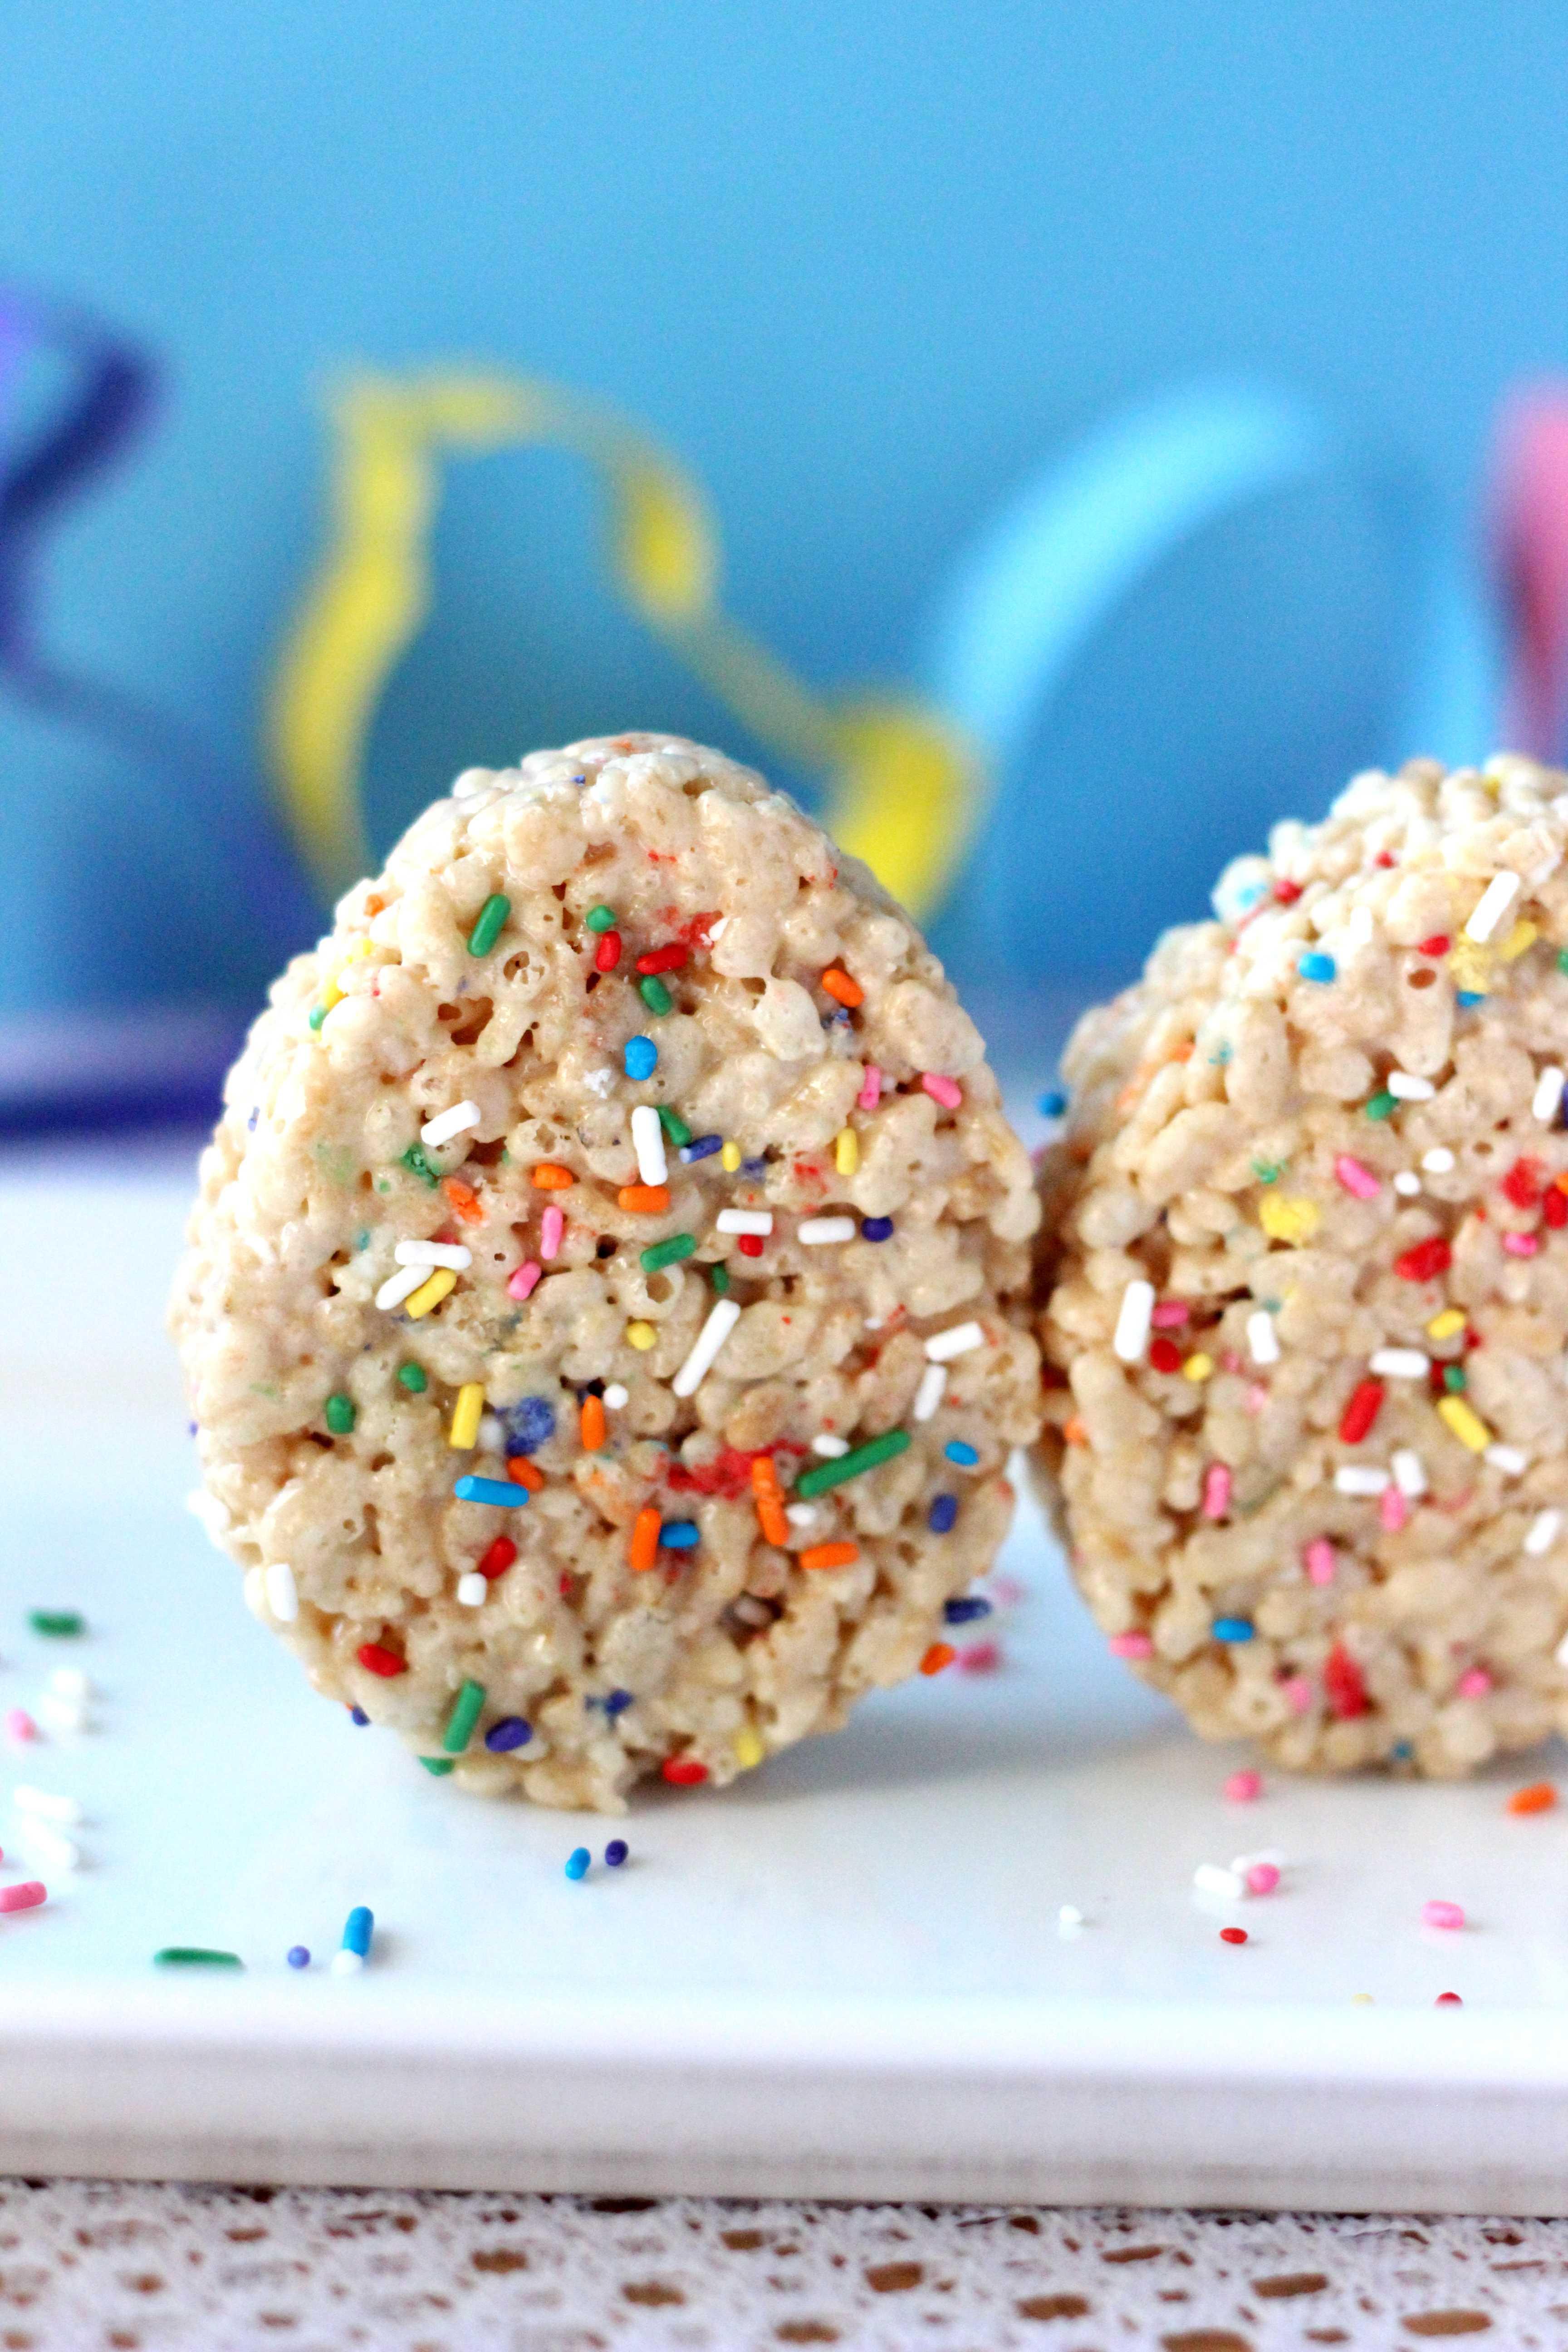 Cake Mix Rice Crispy Treat Easter Eggs